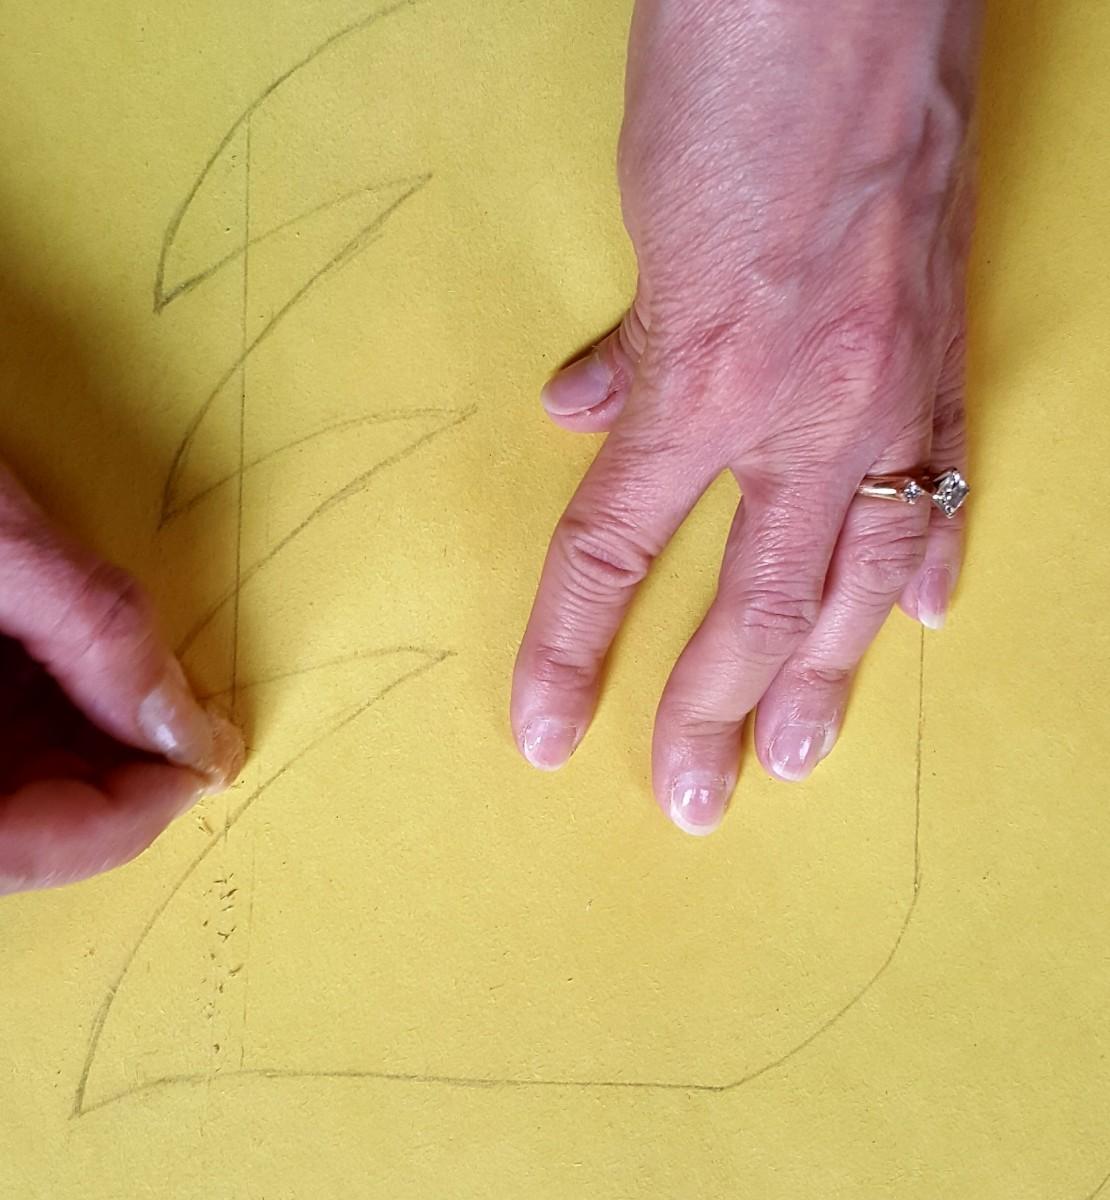 Erase unwanted lines